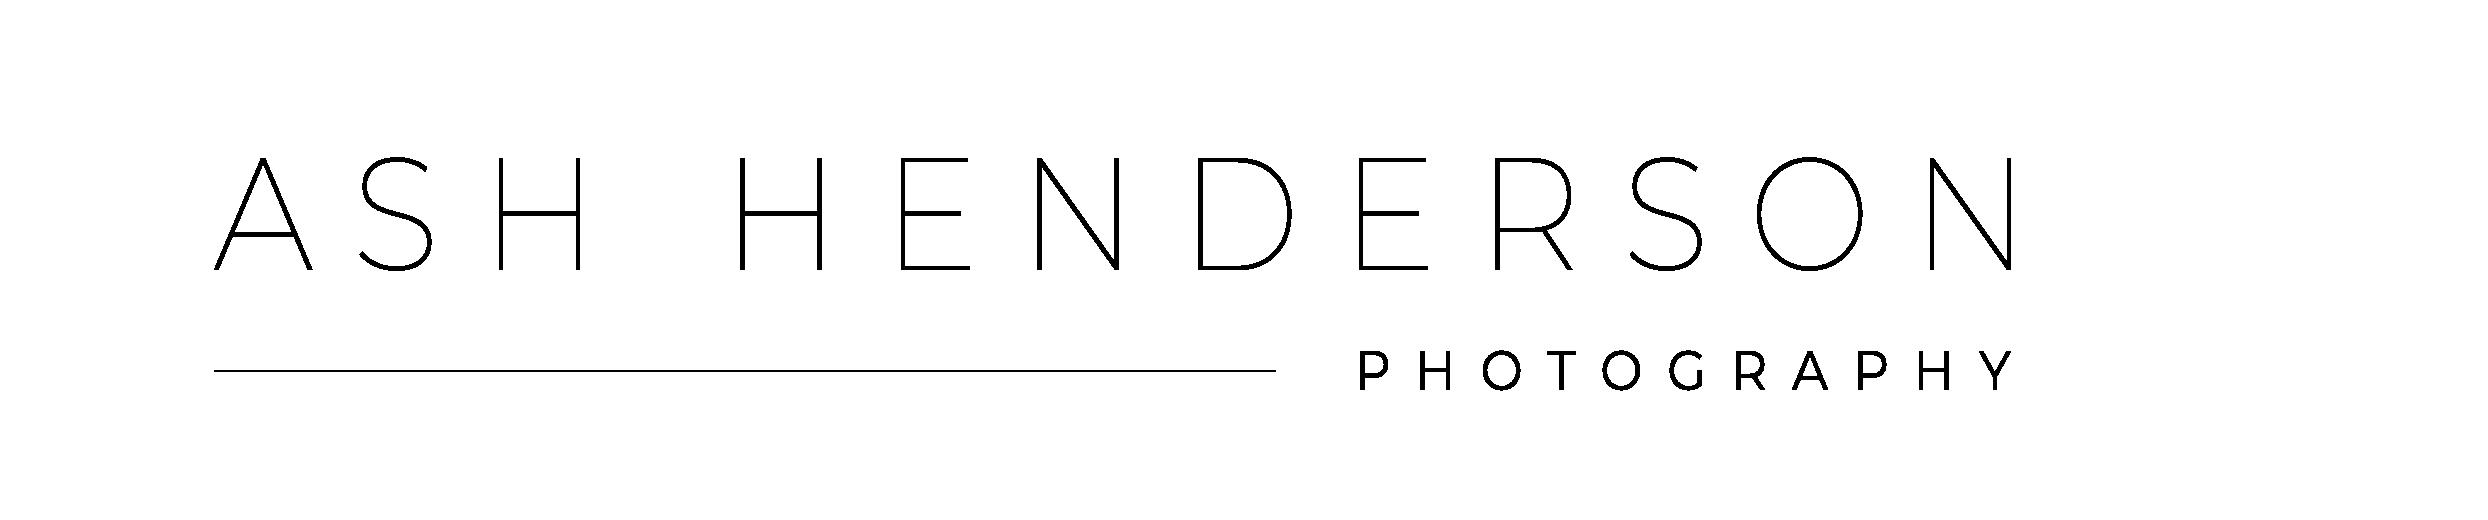 ash-henderson-photography-logo-01